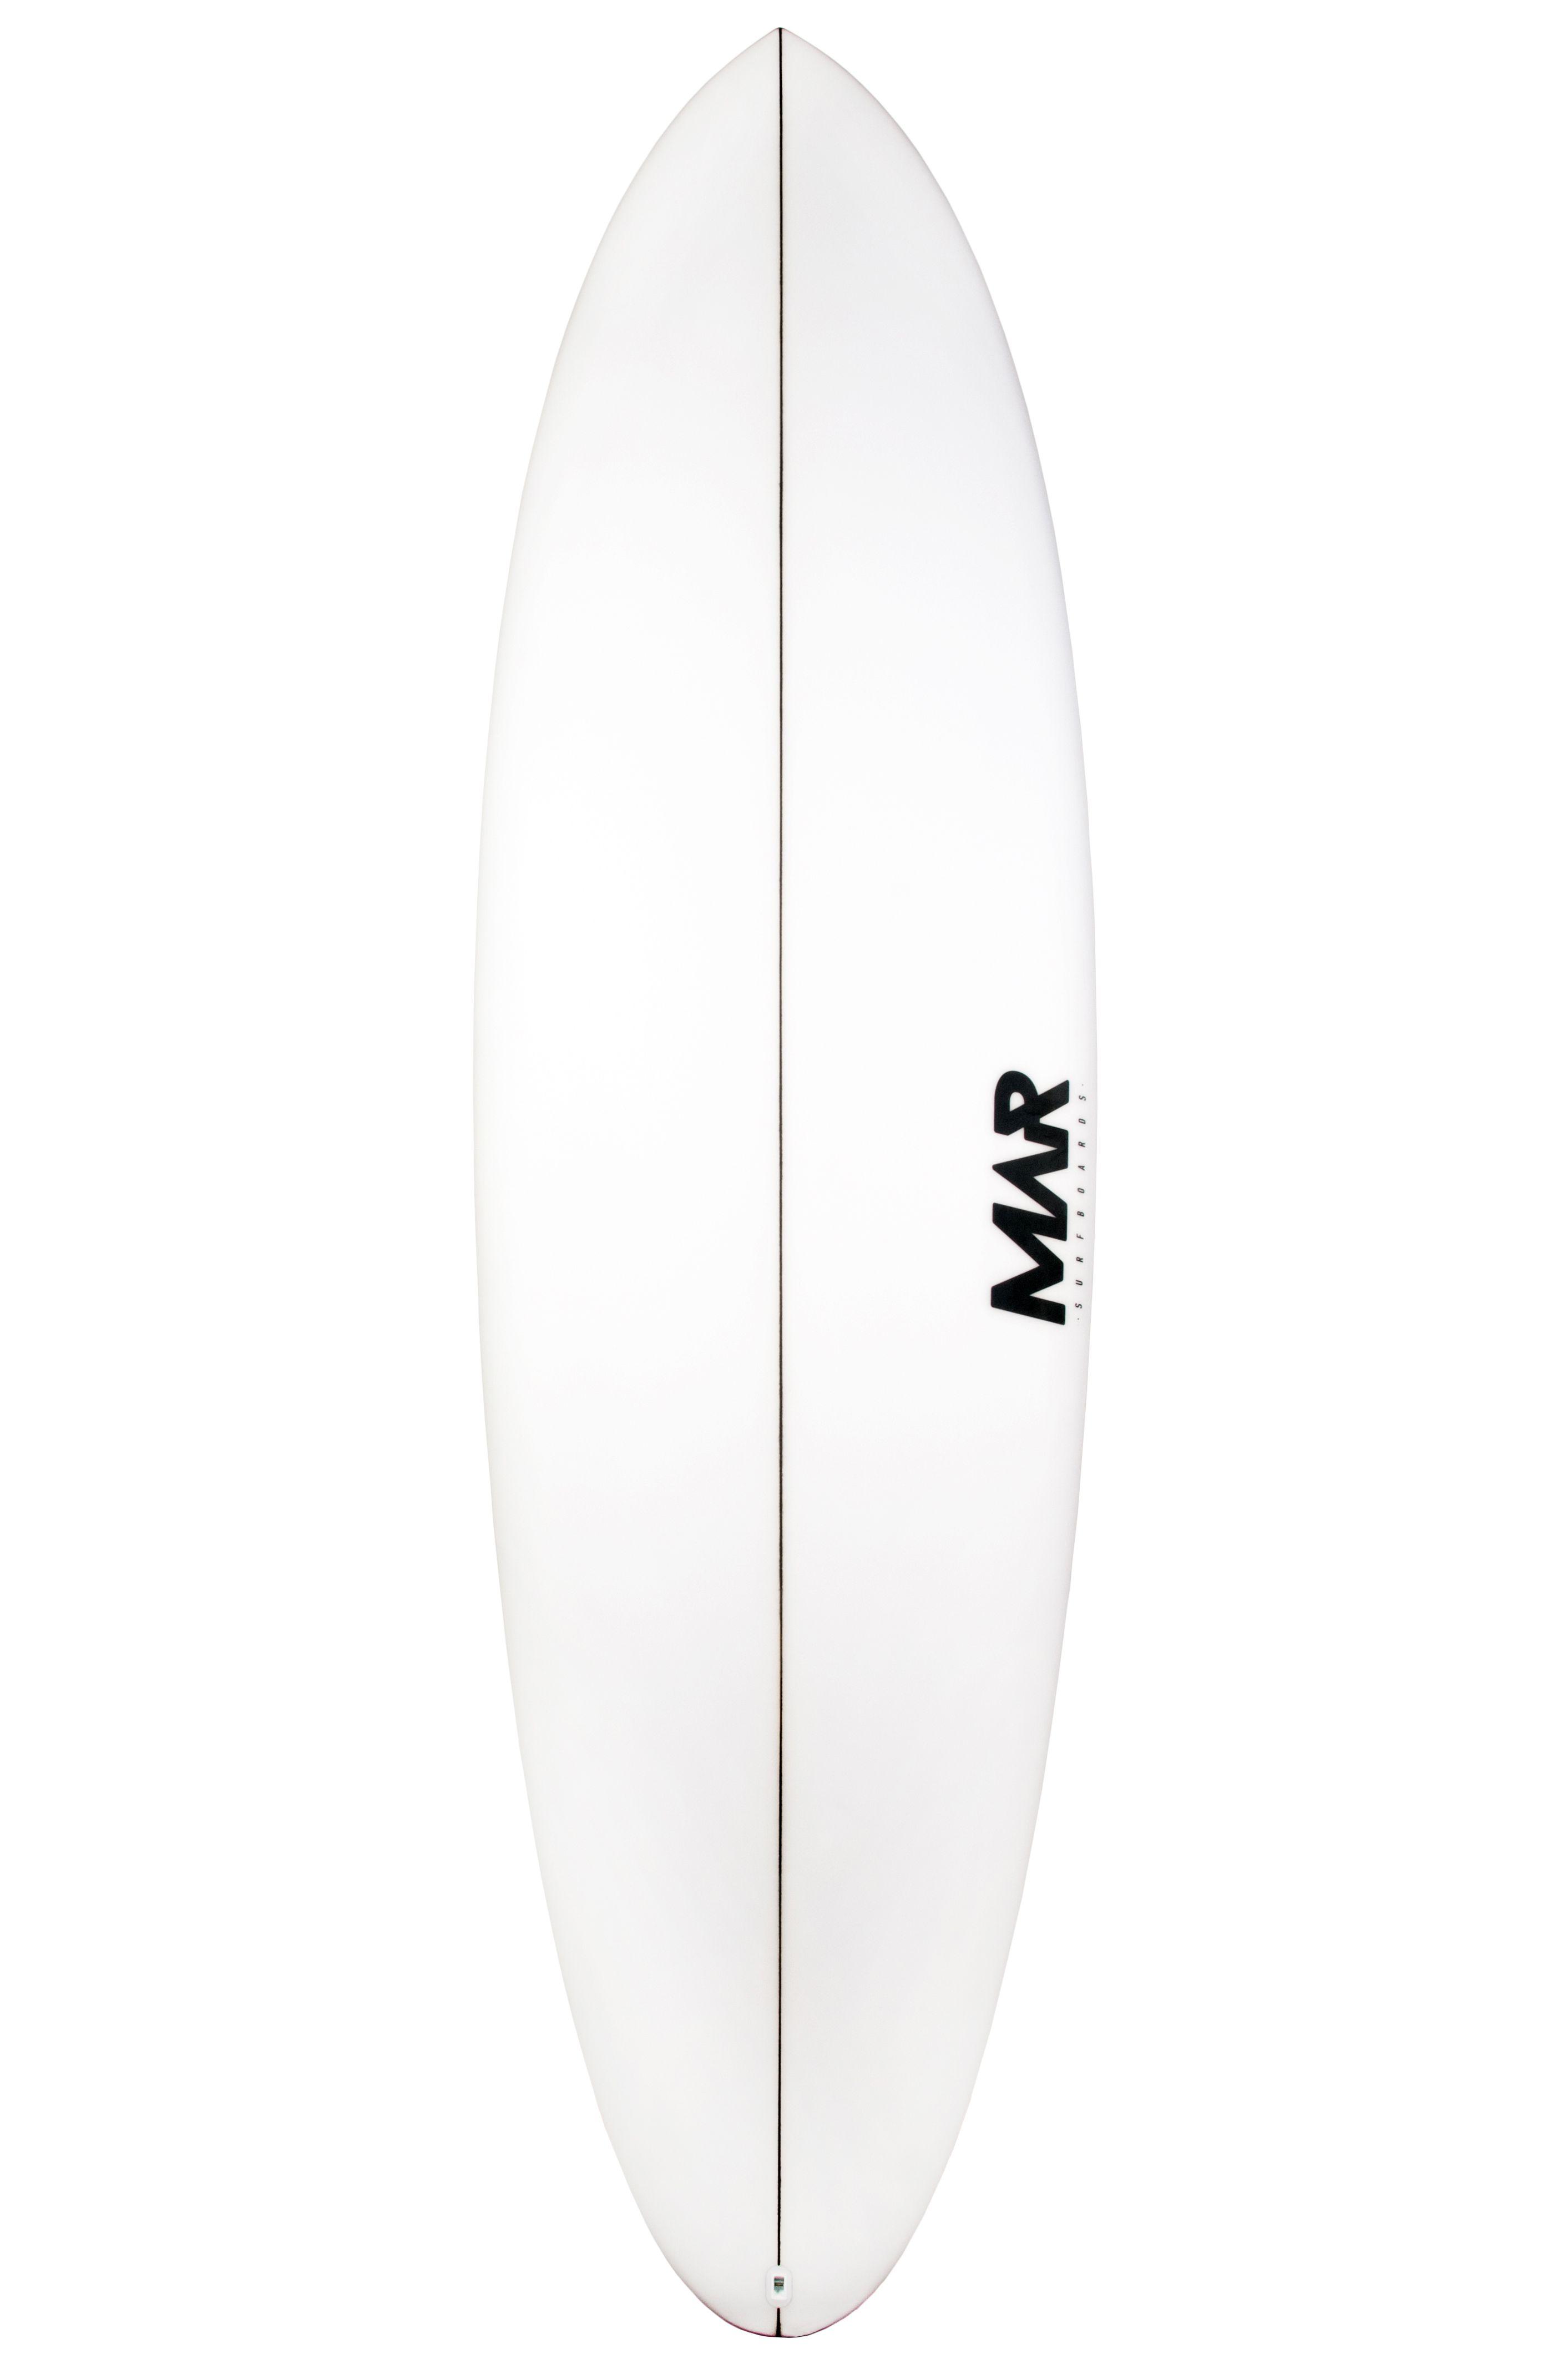 Prancha Surf Mar 6'6 MAR MID PU Round Pin Tail - White FCS II Multisystem 6ft6